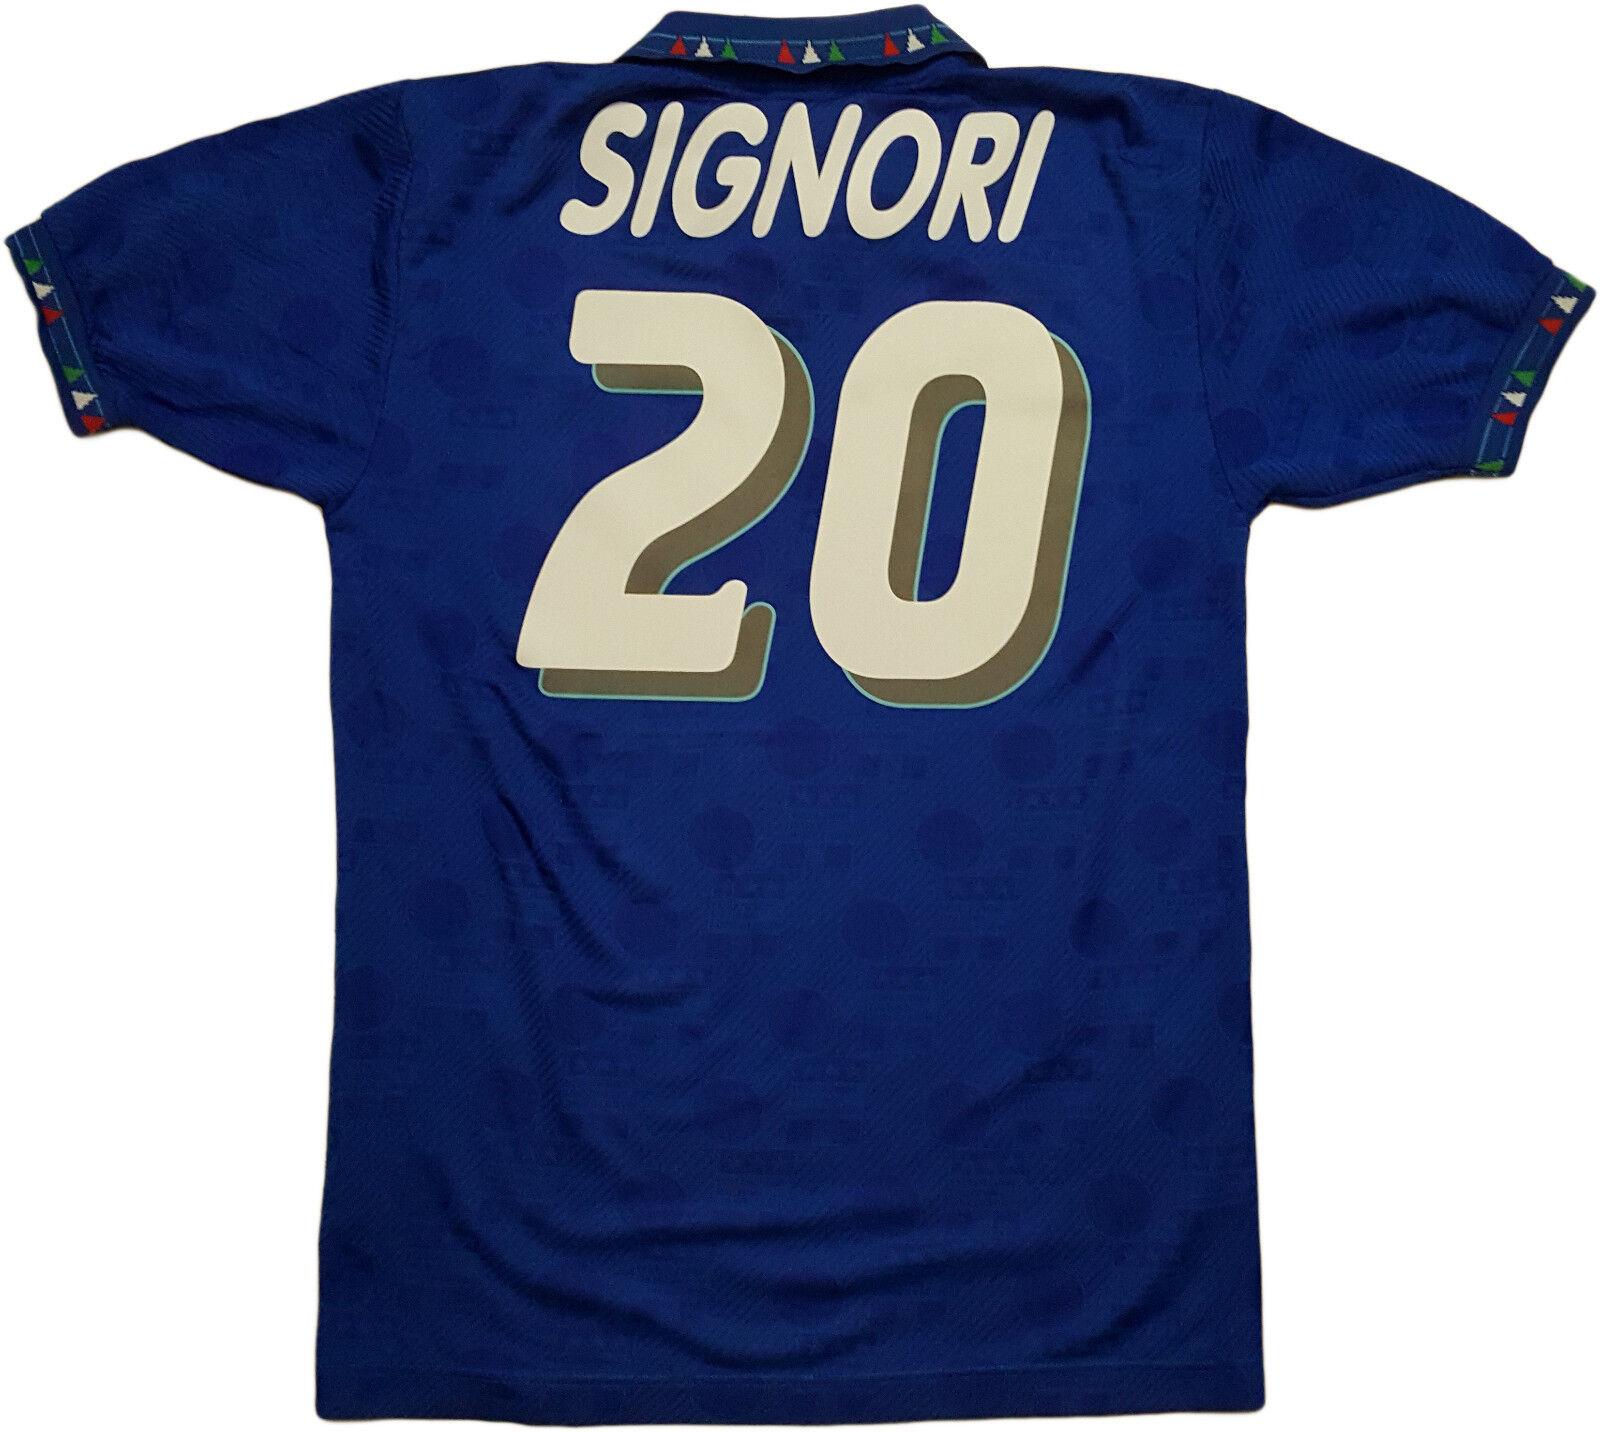 Italia diadora 1994 Signori  20  world cup shirt jersey maglia USA 94 mondiale